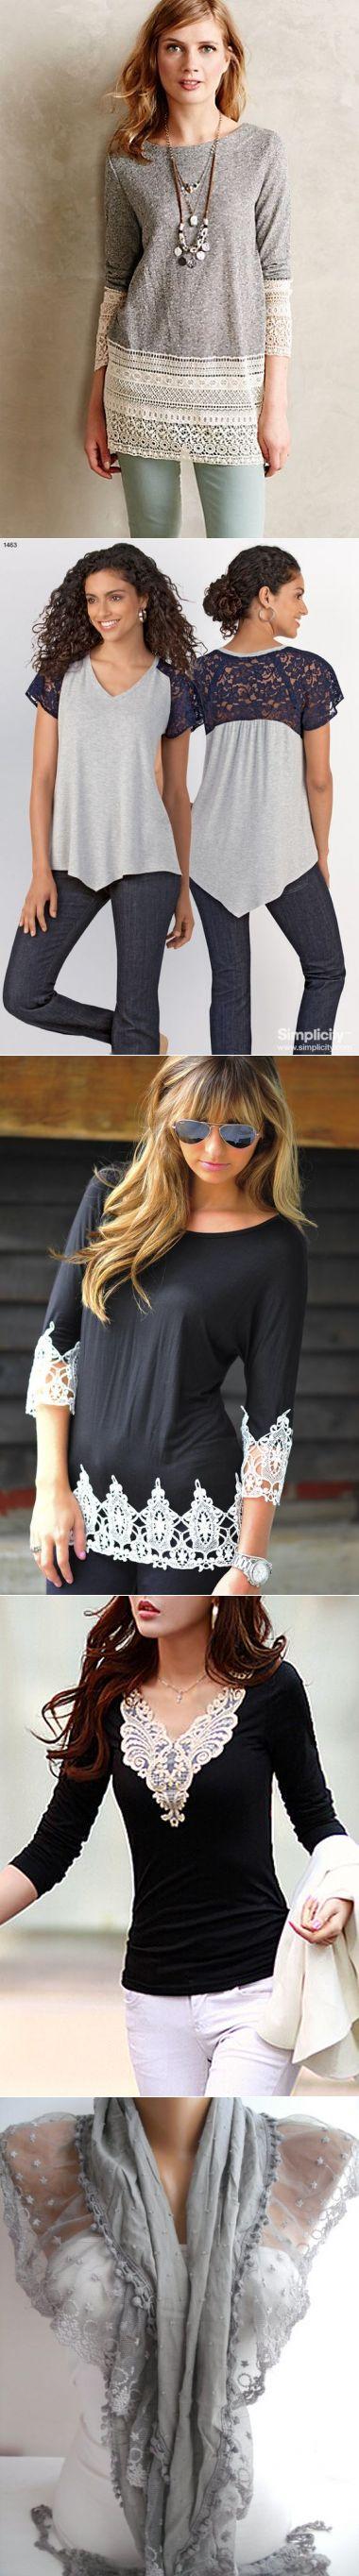 lace blouse shirt change...♥ Deniz ♥